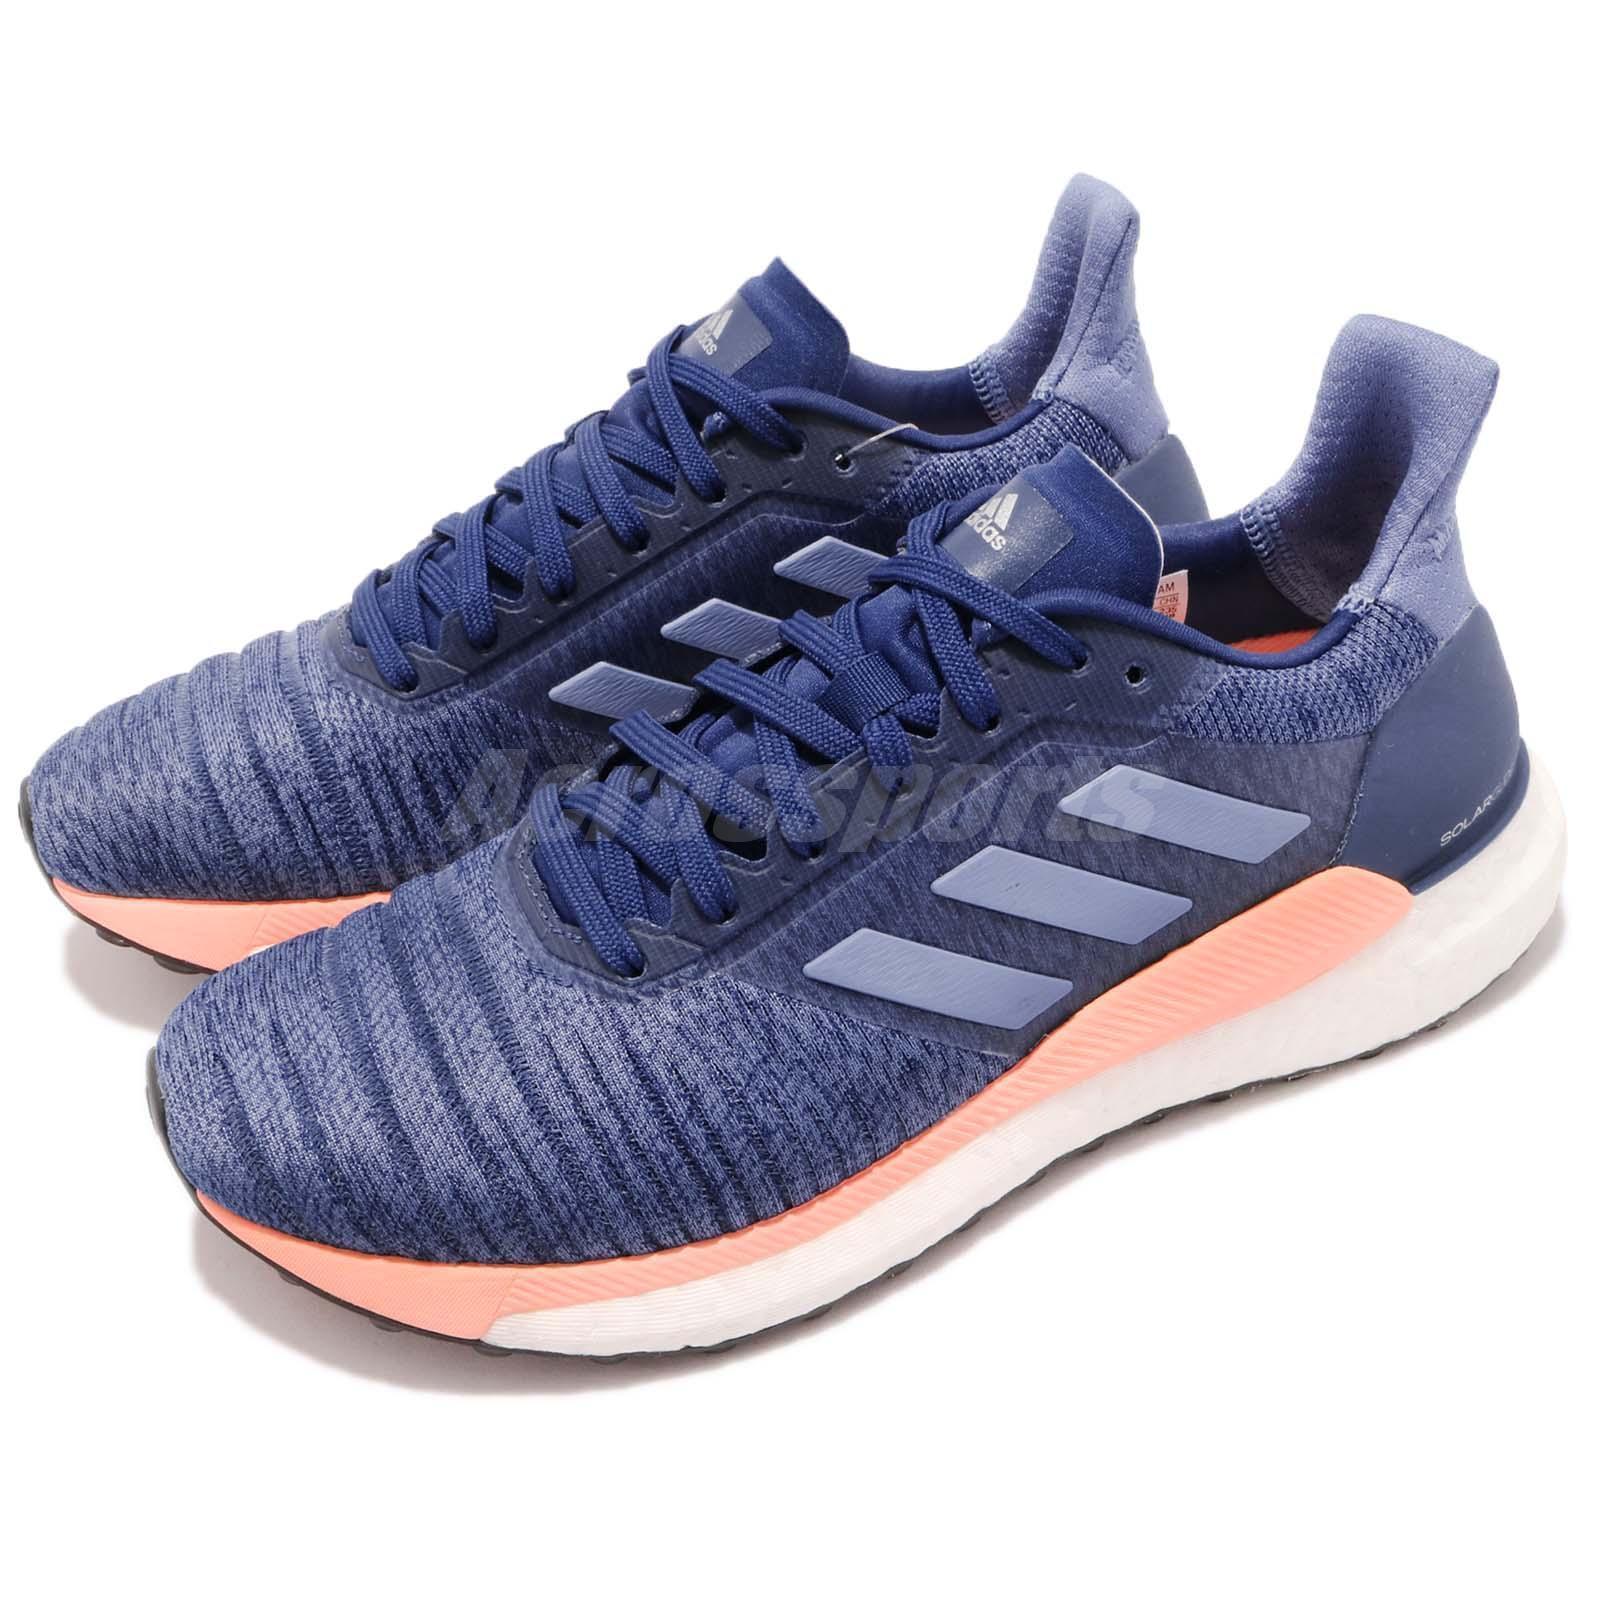 Adidas Solar Glide W Mystery Ink bluee Clean orange Women Running shoes AQ0334